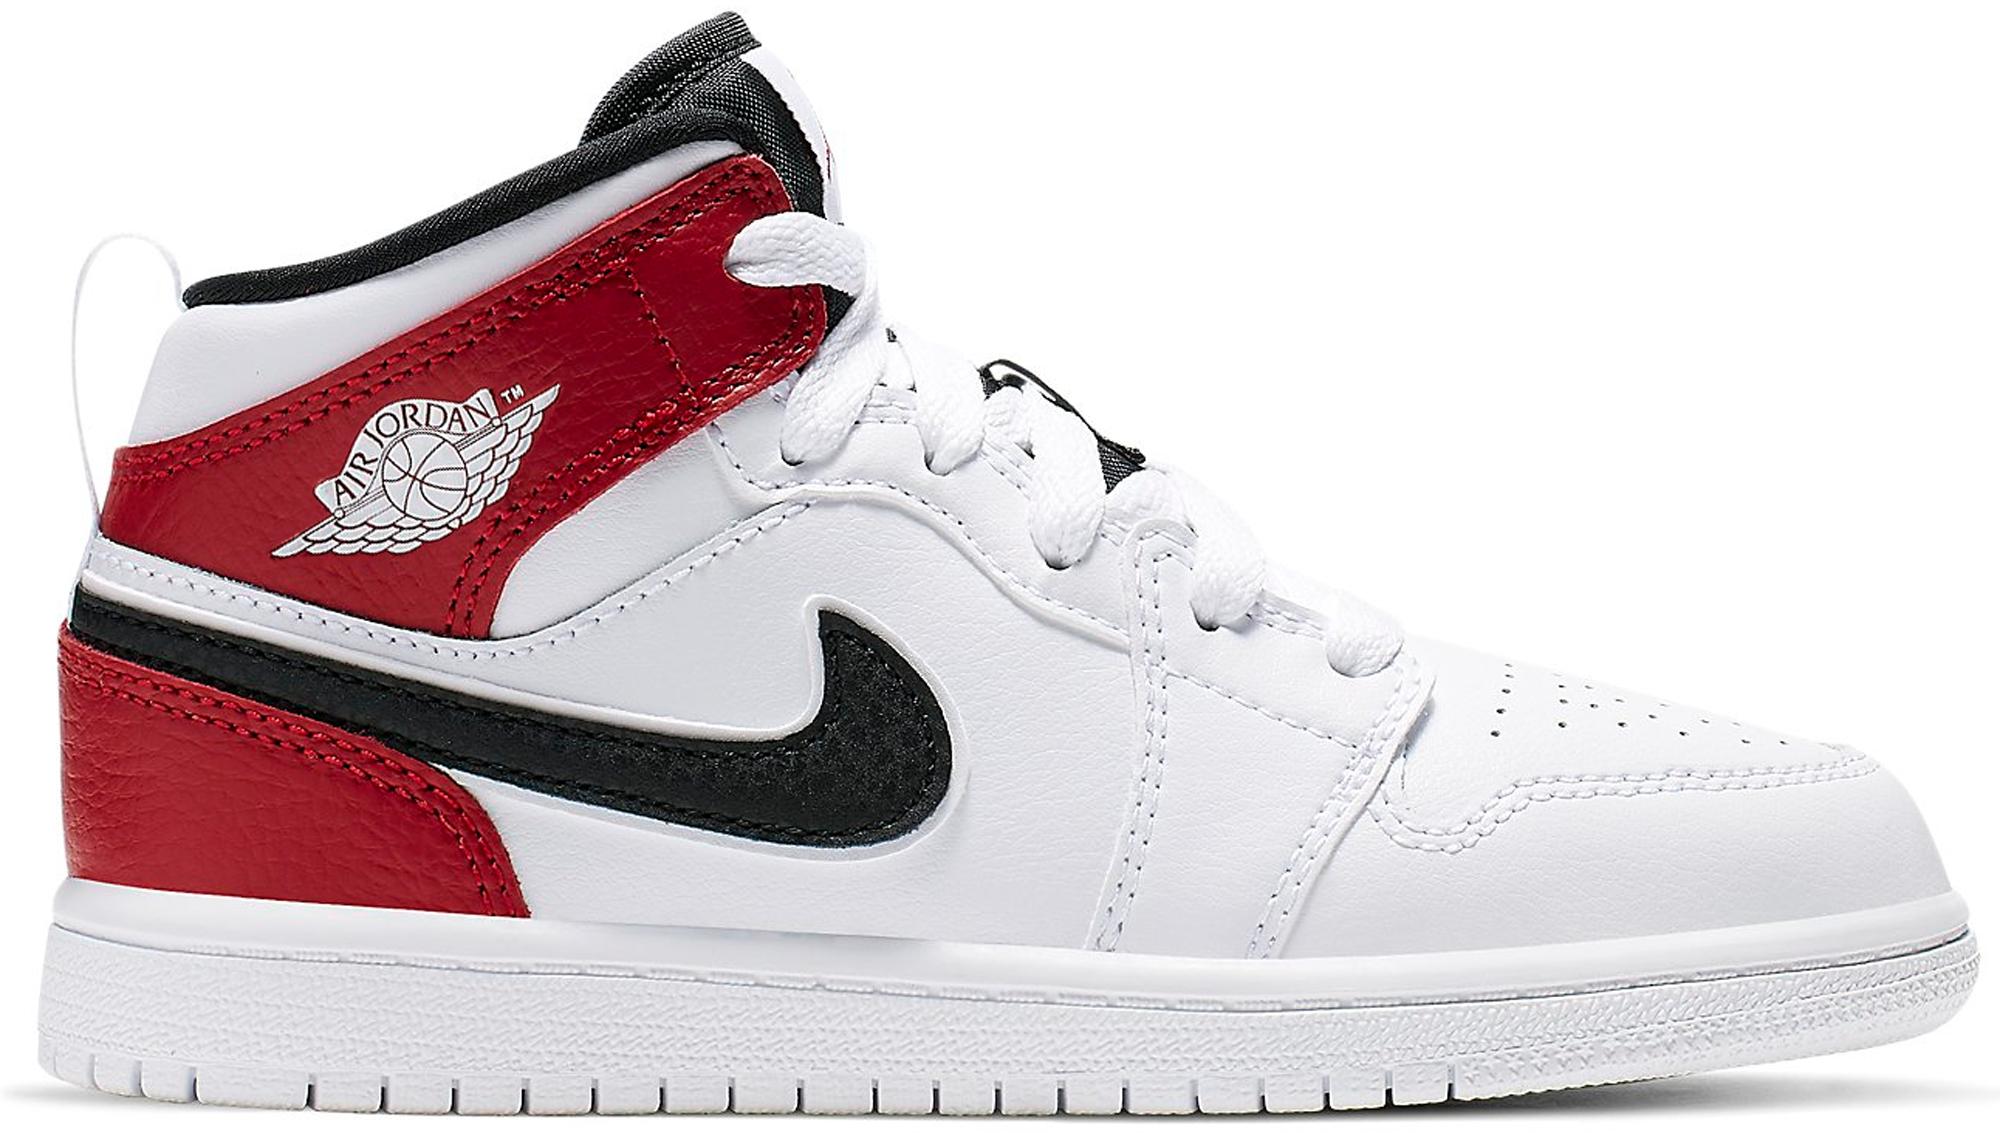 Jordan 1 Mid White Black Gym Red (PS